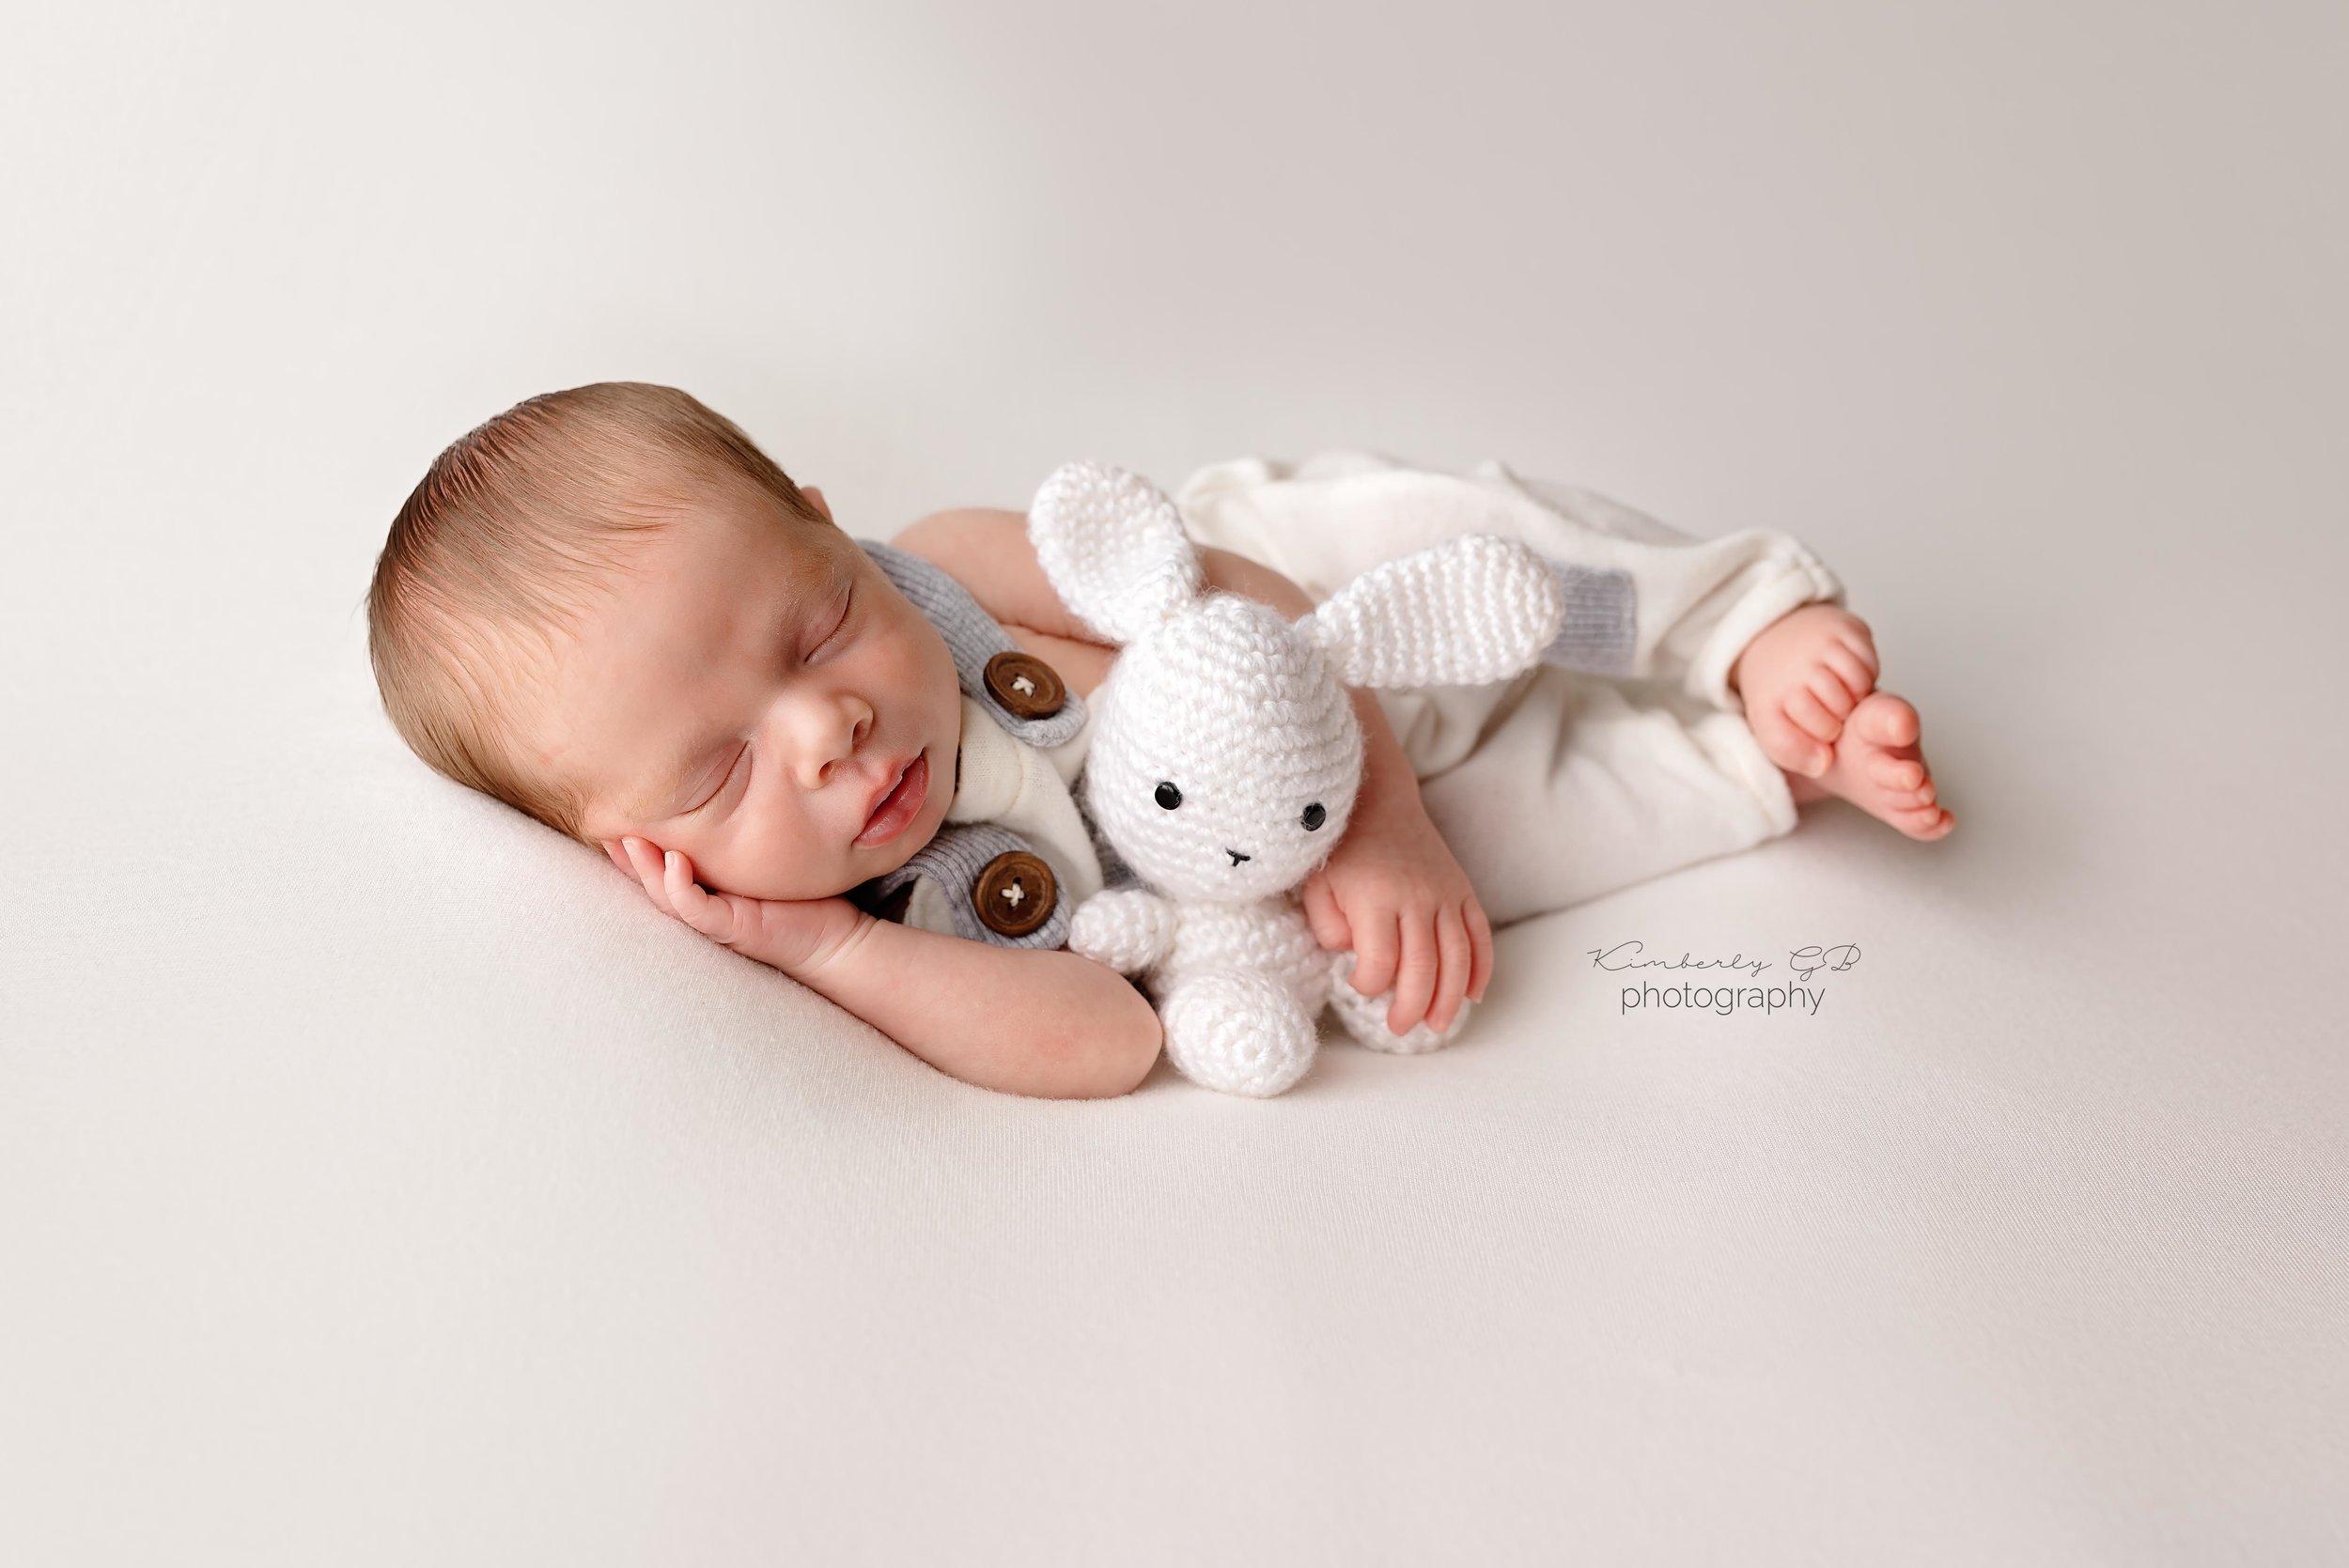 fotografia-de-recien-nacidos-bebes-newborn-en-puerto-rico-kimberly-gb-photography-fotografa-235.jpg